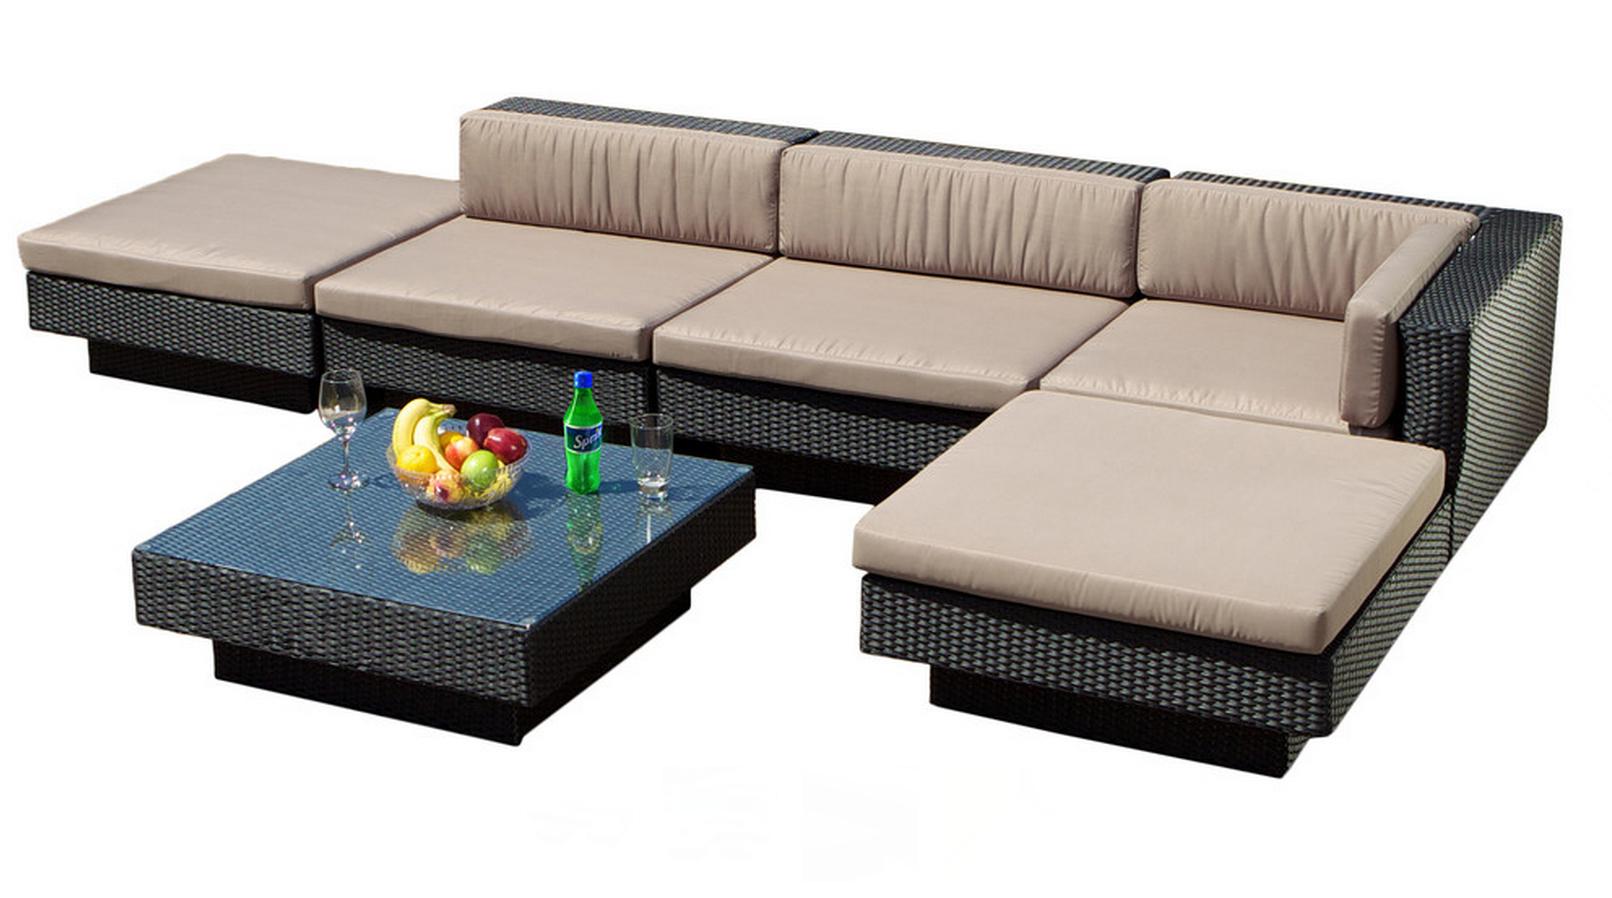 3rd floor balcony - Santa Maria Outdoor Sectional Sofa Set - Great Deal Furniture